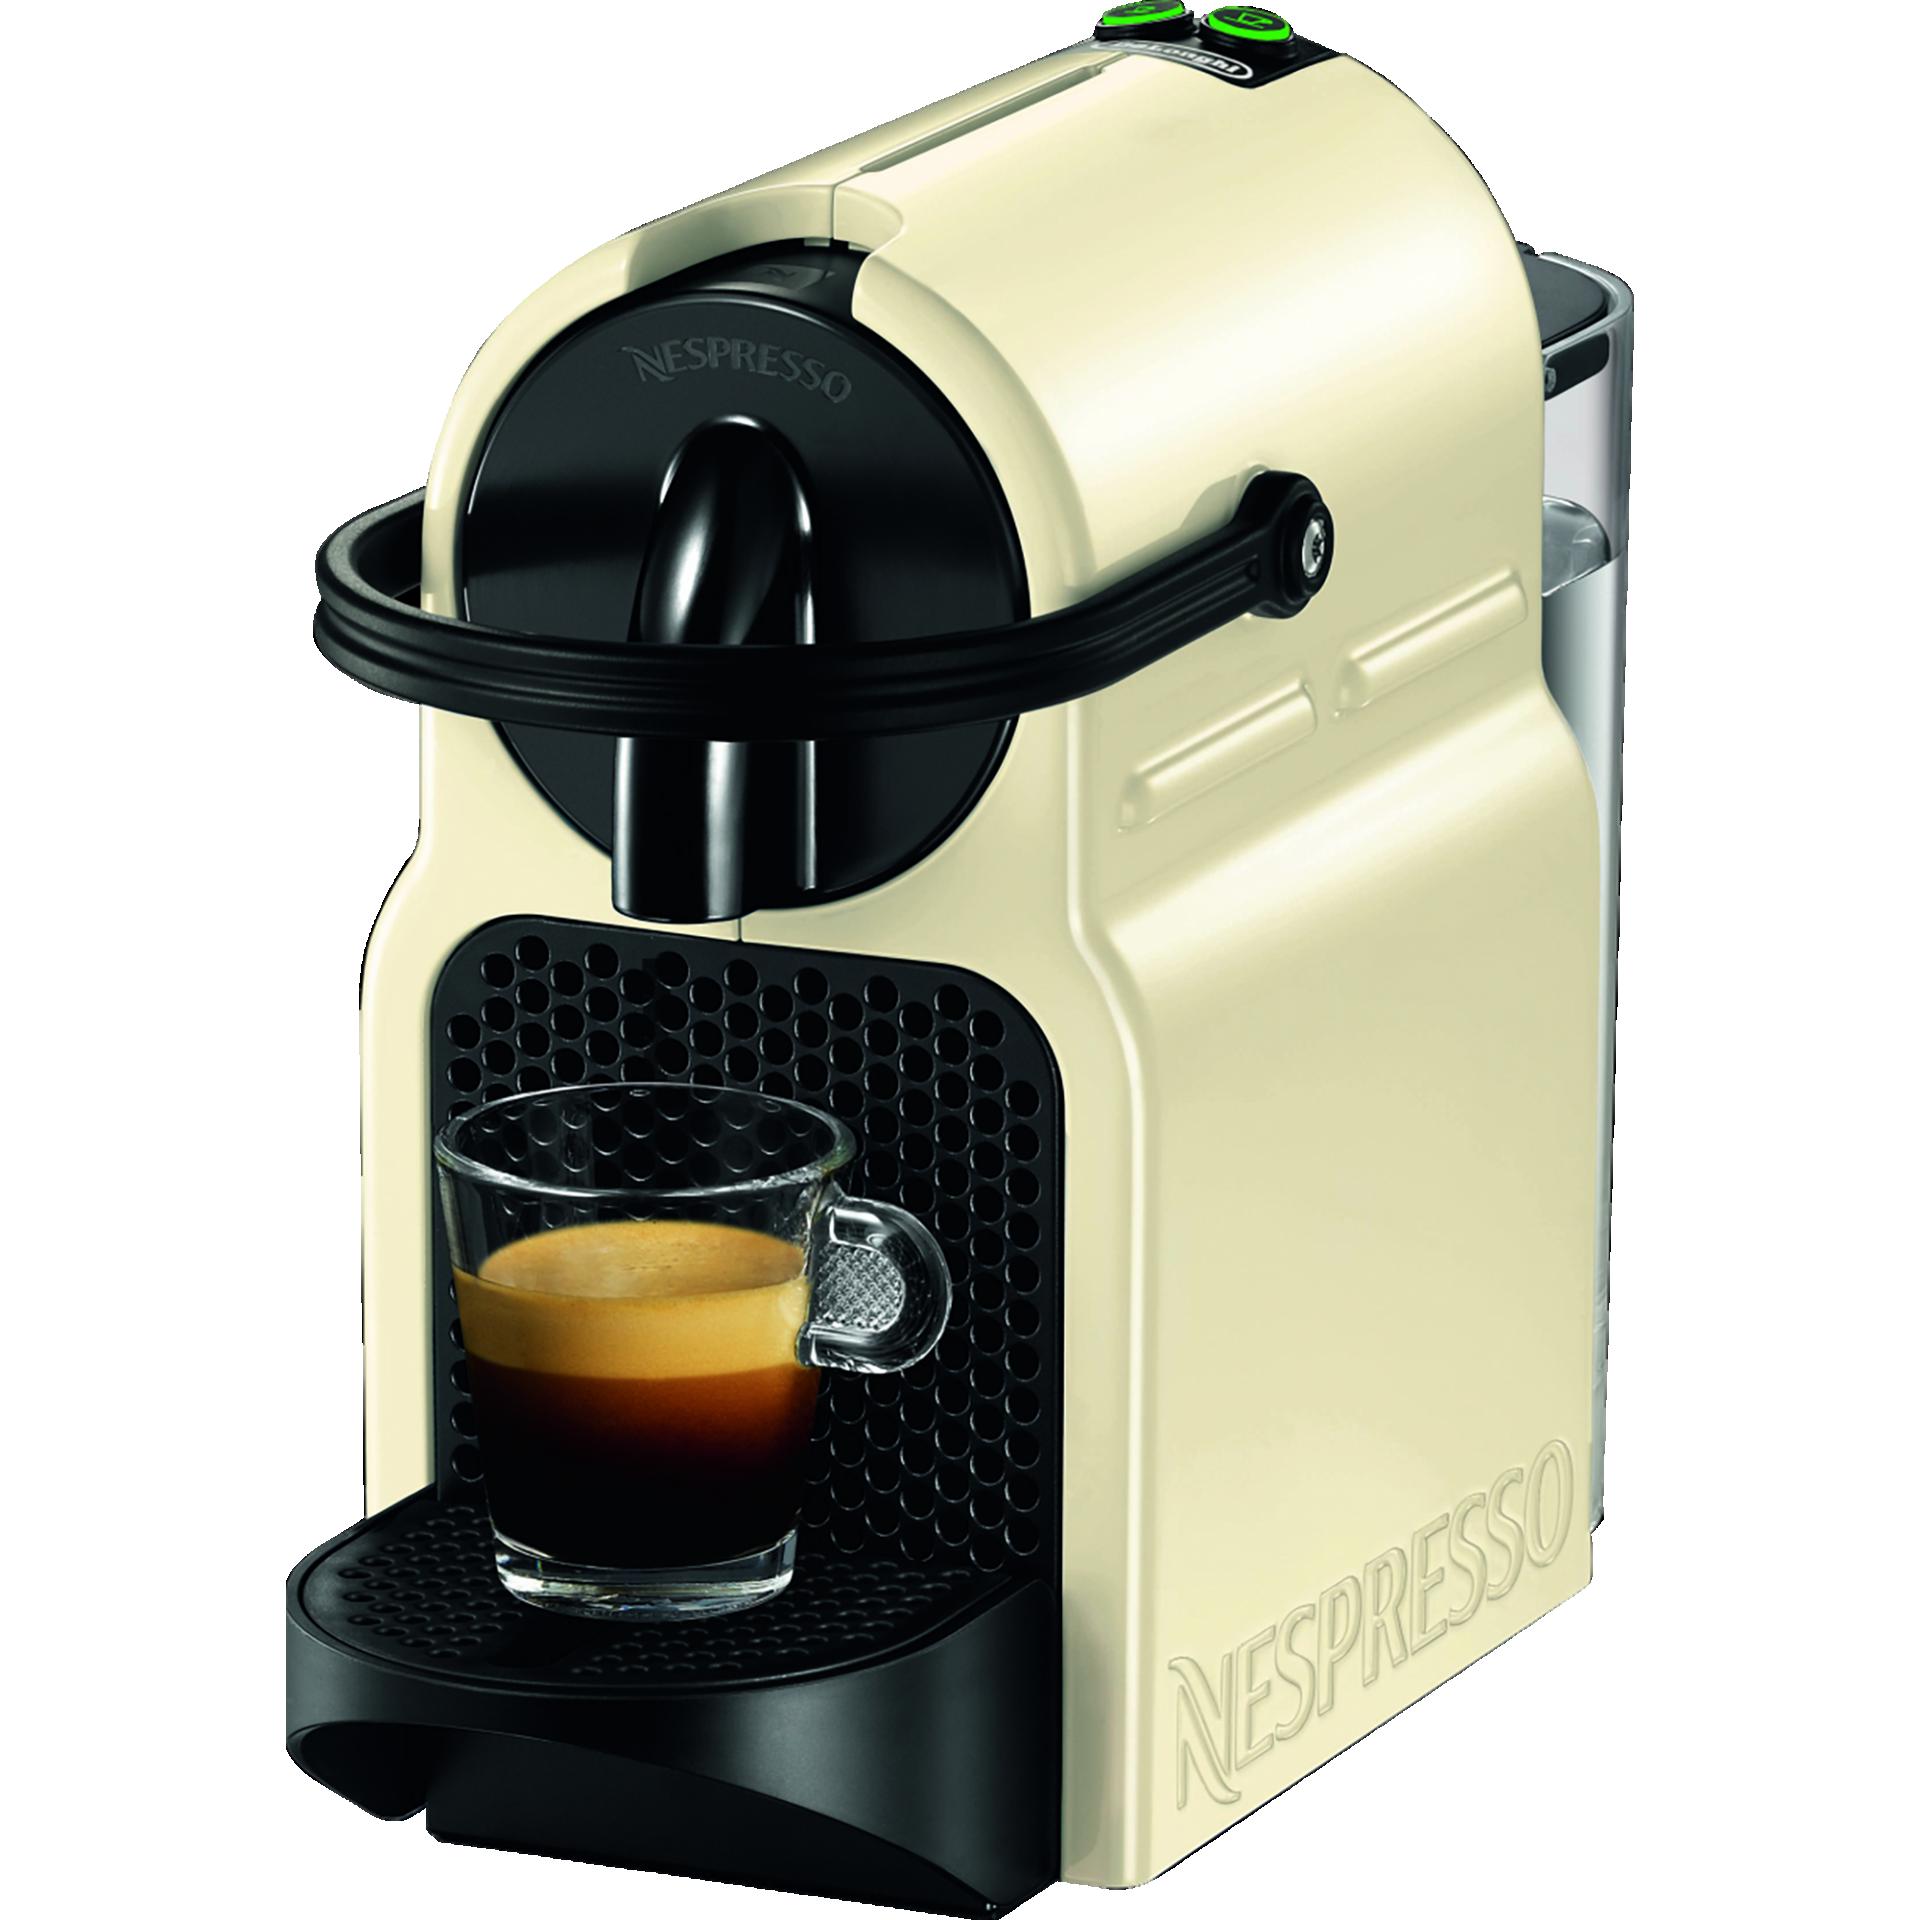 Nespresso EN80 Inissia kapszulás kávéfőző